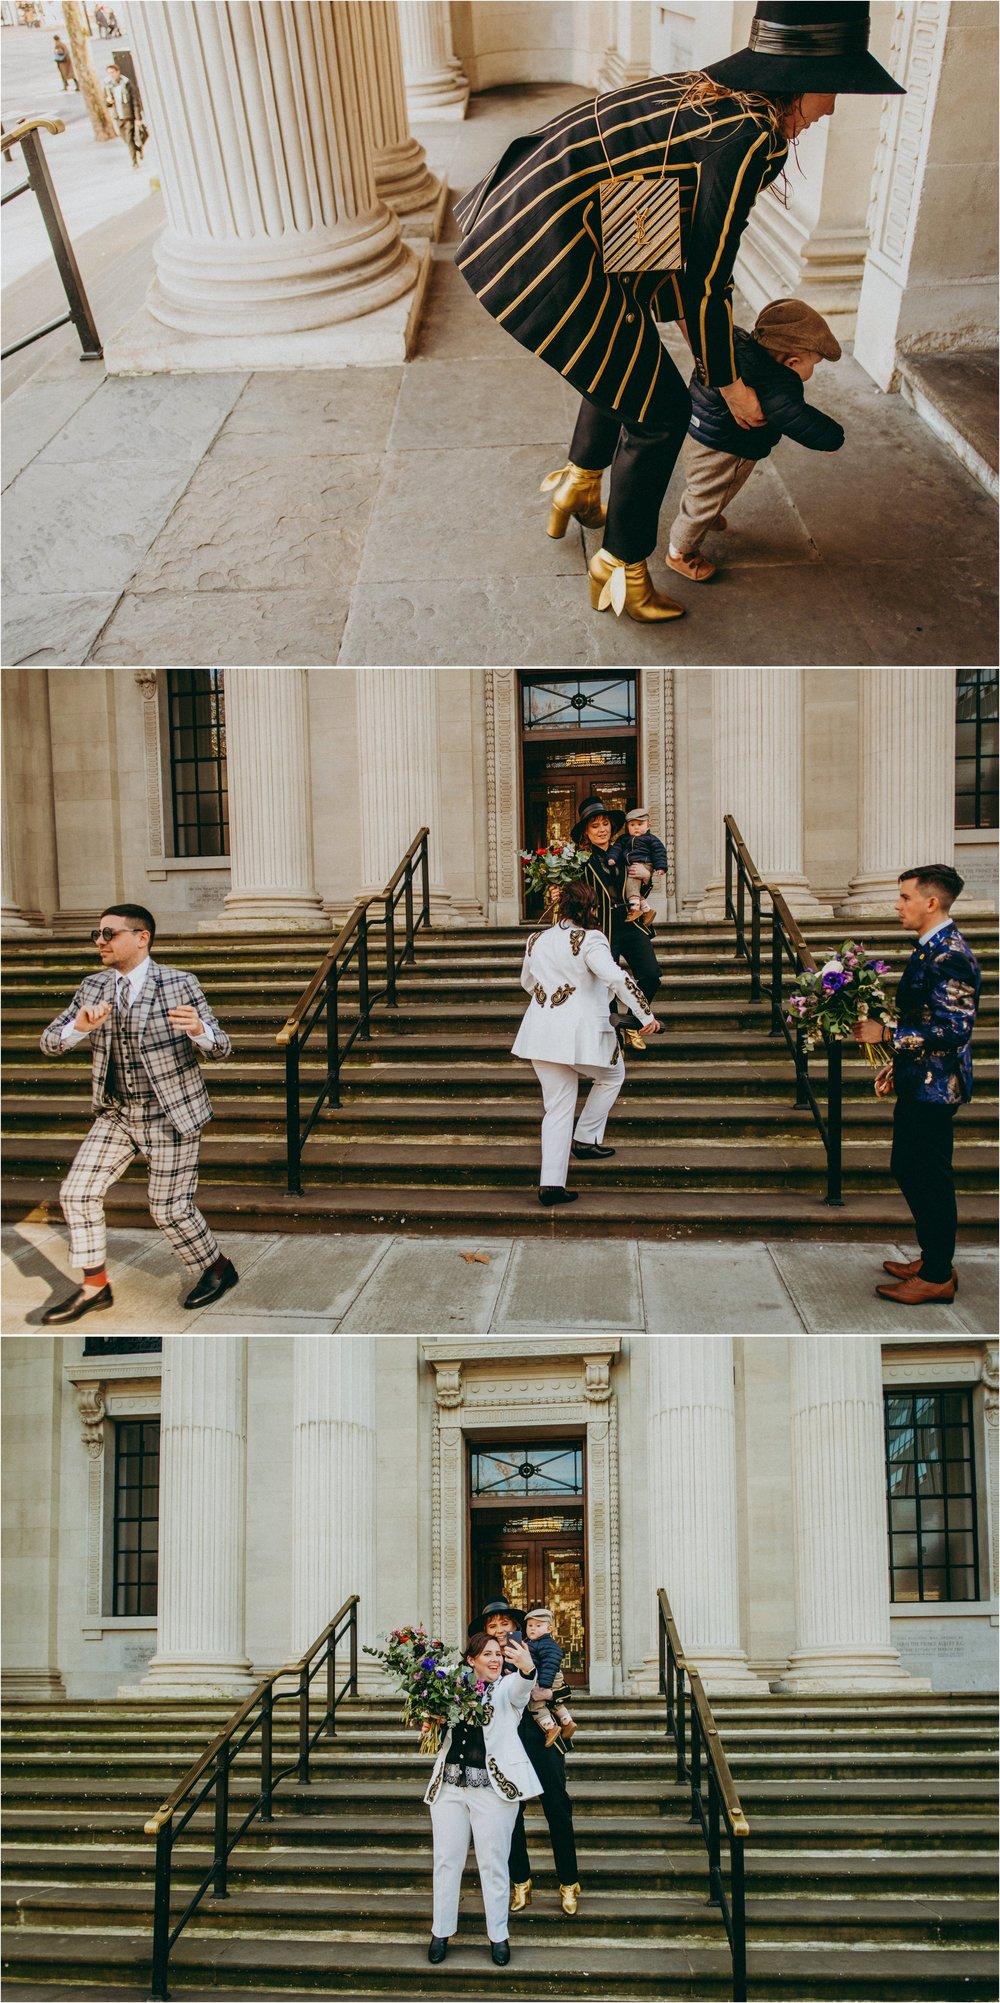 London elopement lesbian wedding_0058.jpg